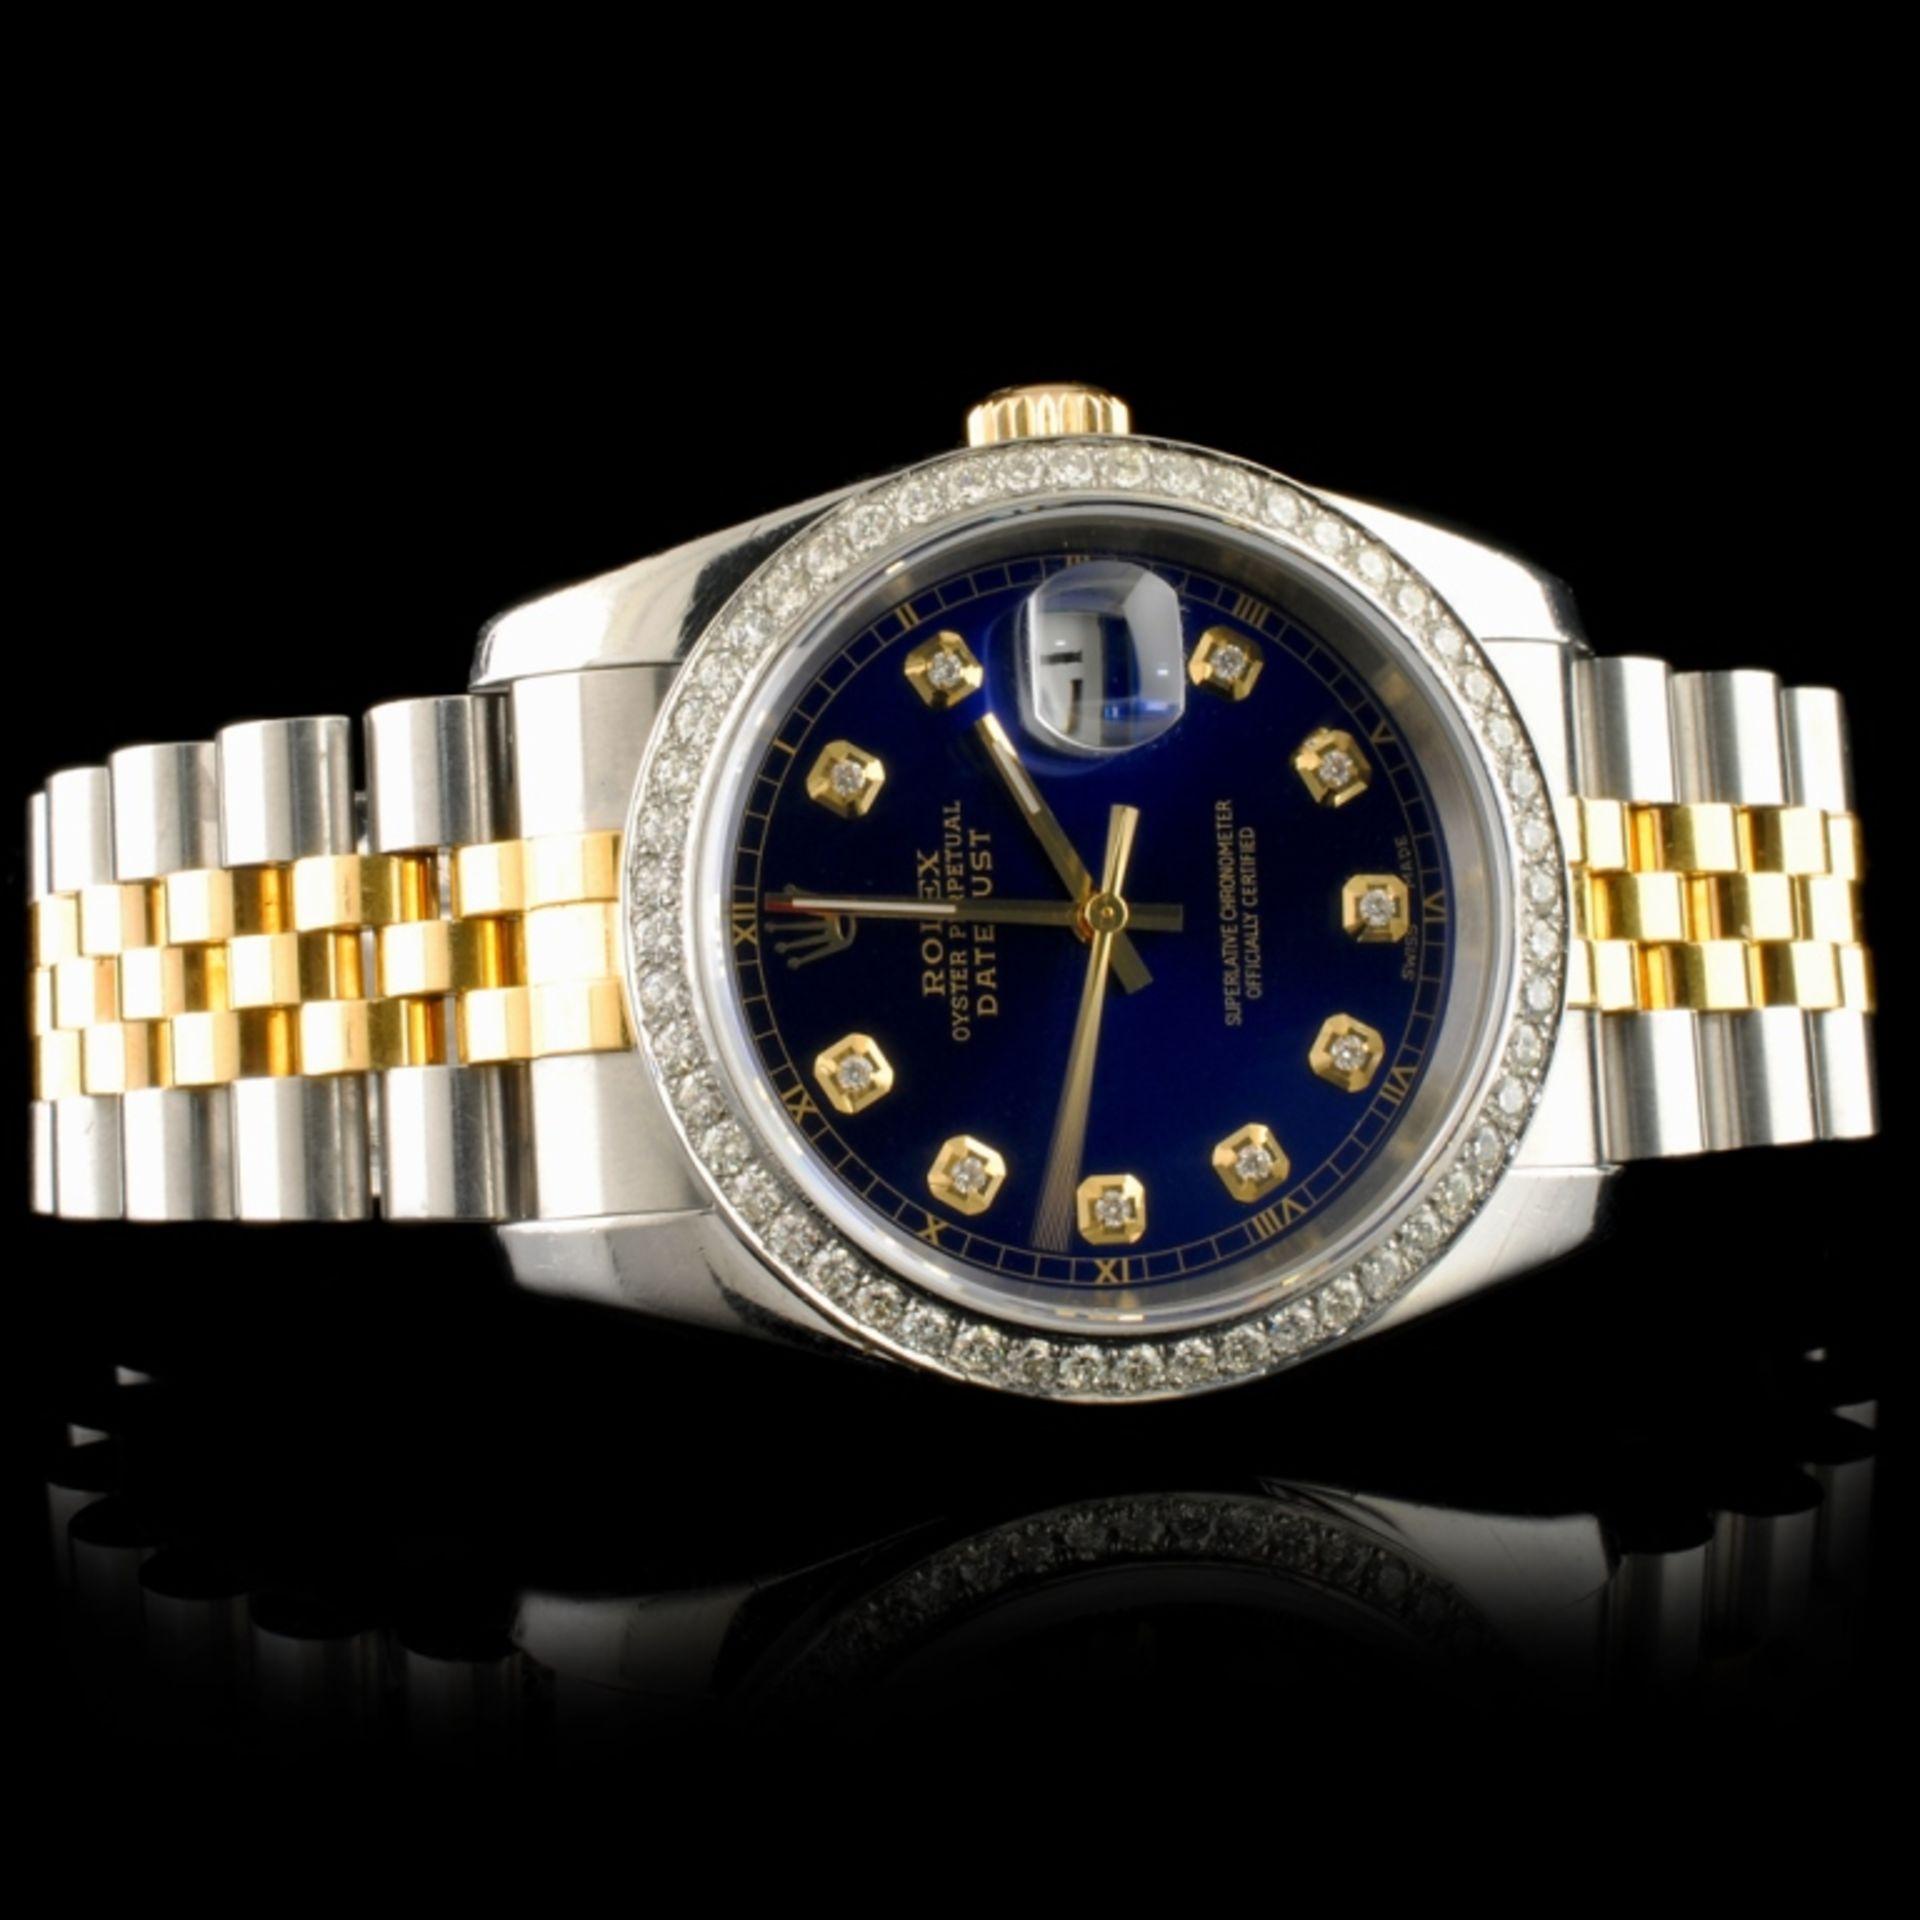 Rolex DateJust 116233 18K YG/SS Diamond 36MM Watch - Image 3 of 7